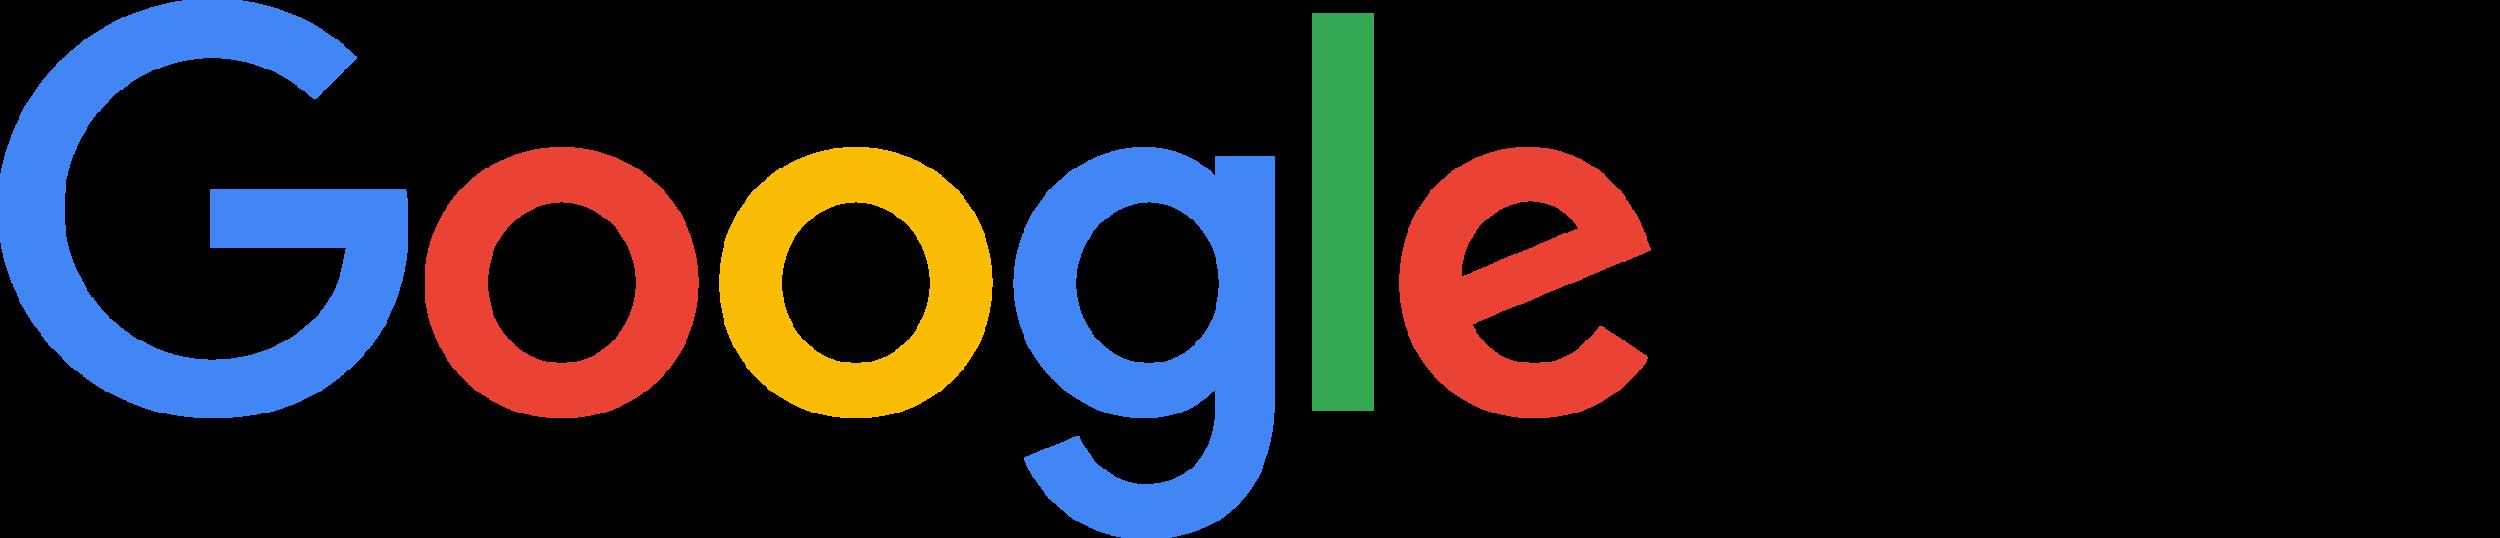 google_org.png